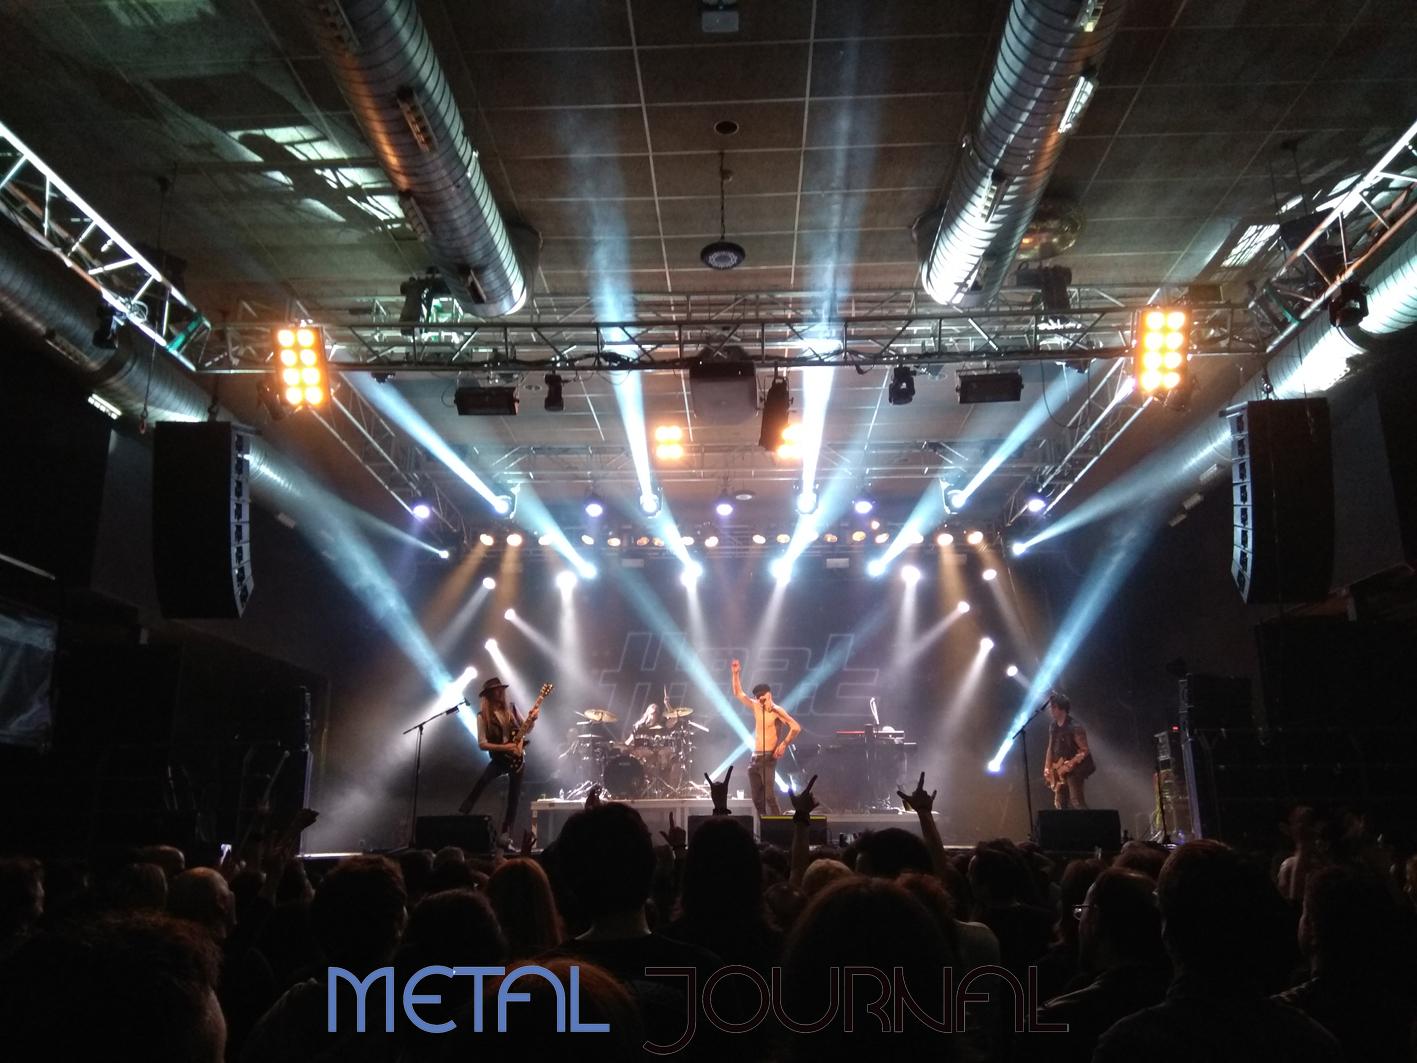 heat bilbao metal journal 2018 pic 12